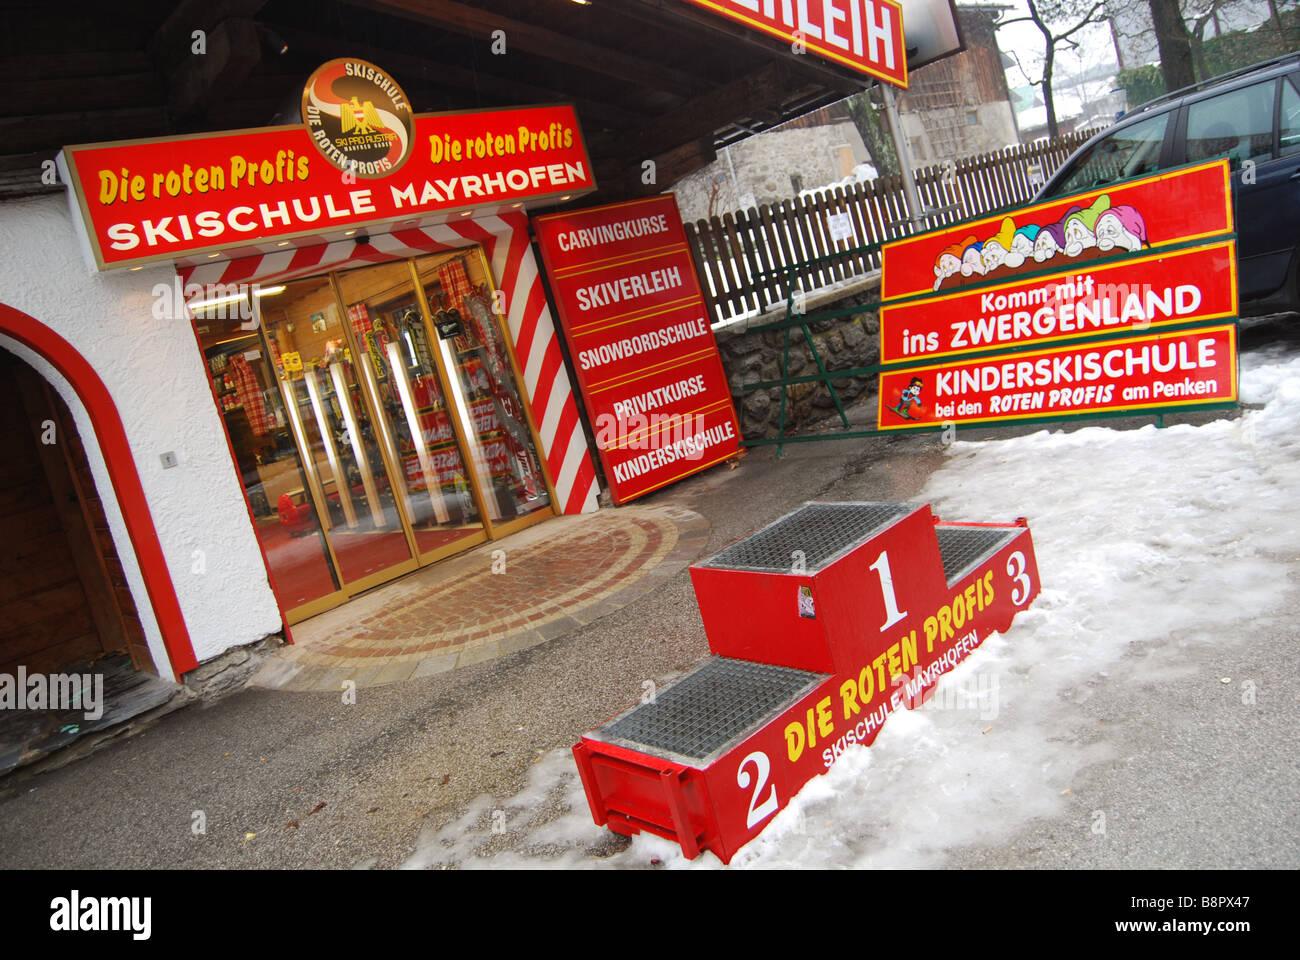 notice boards advertising ski school Mayrhofen Austria Tyrol - Stock Image